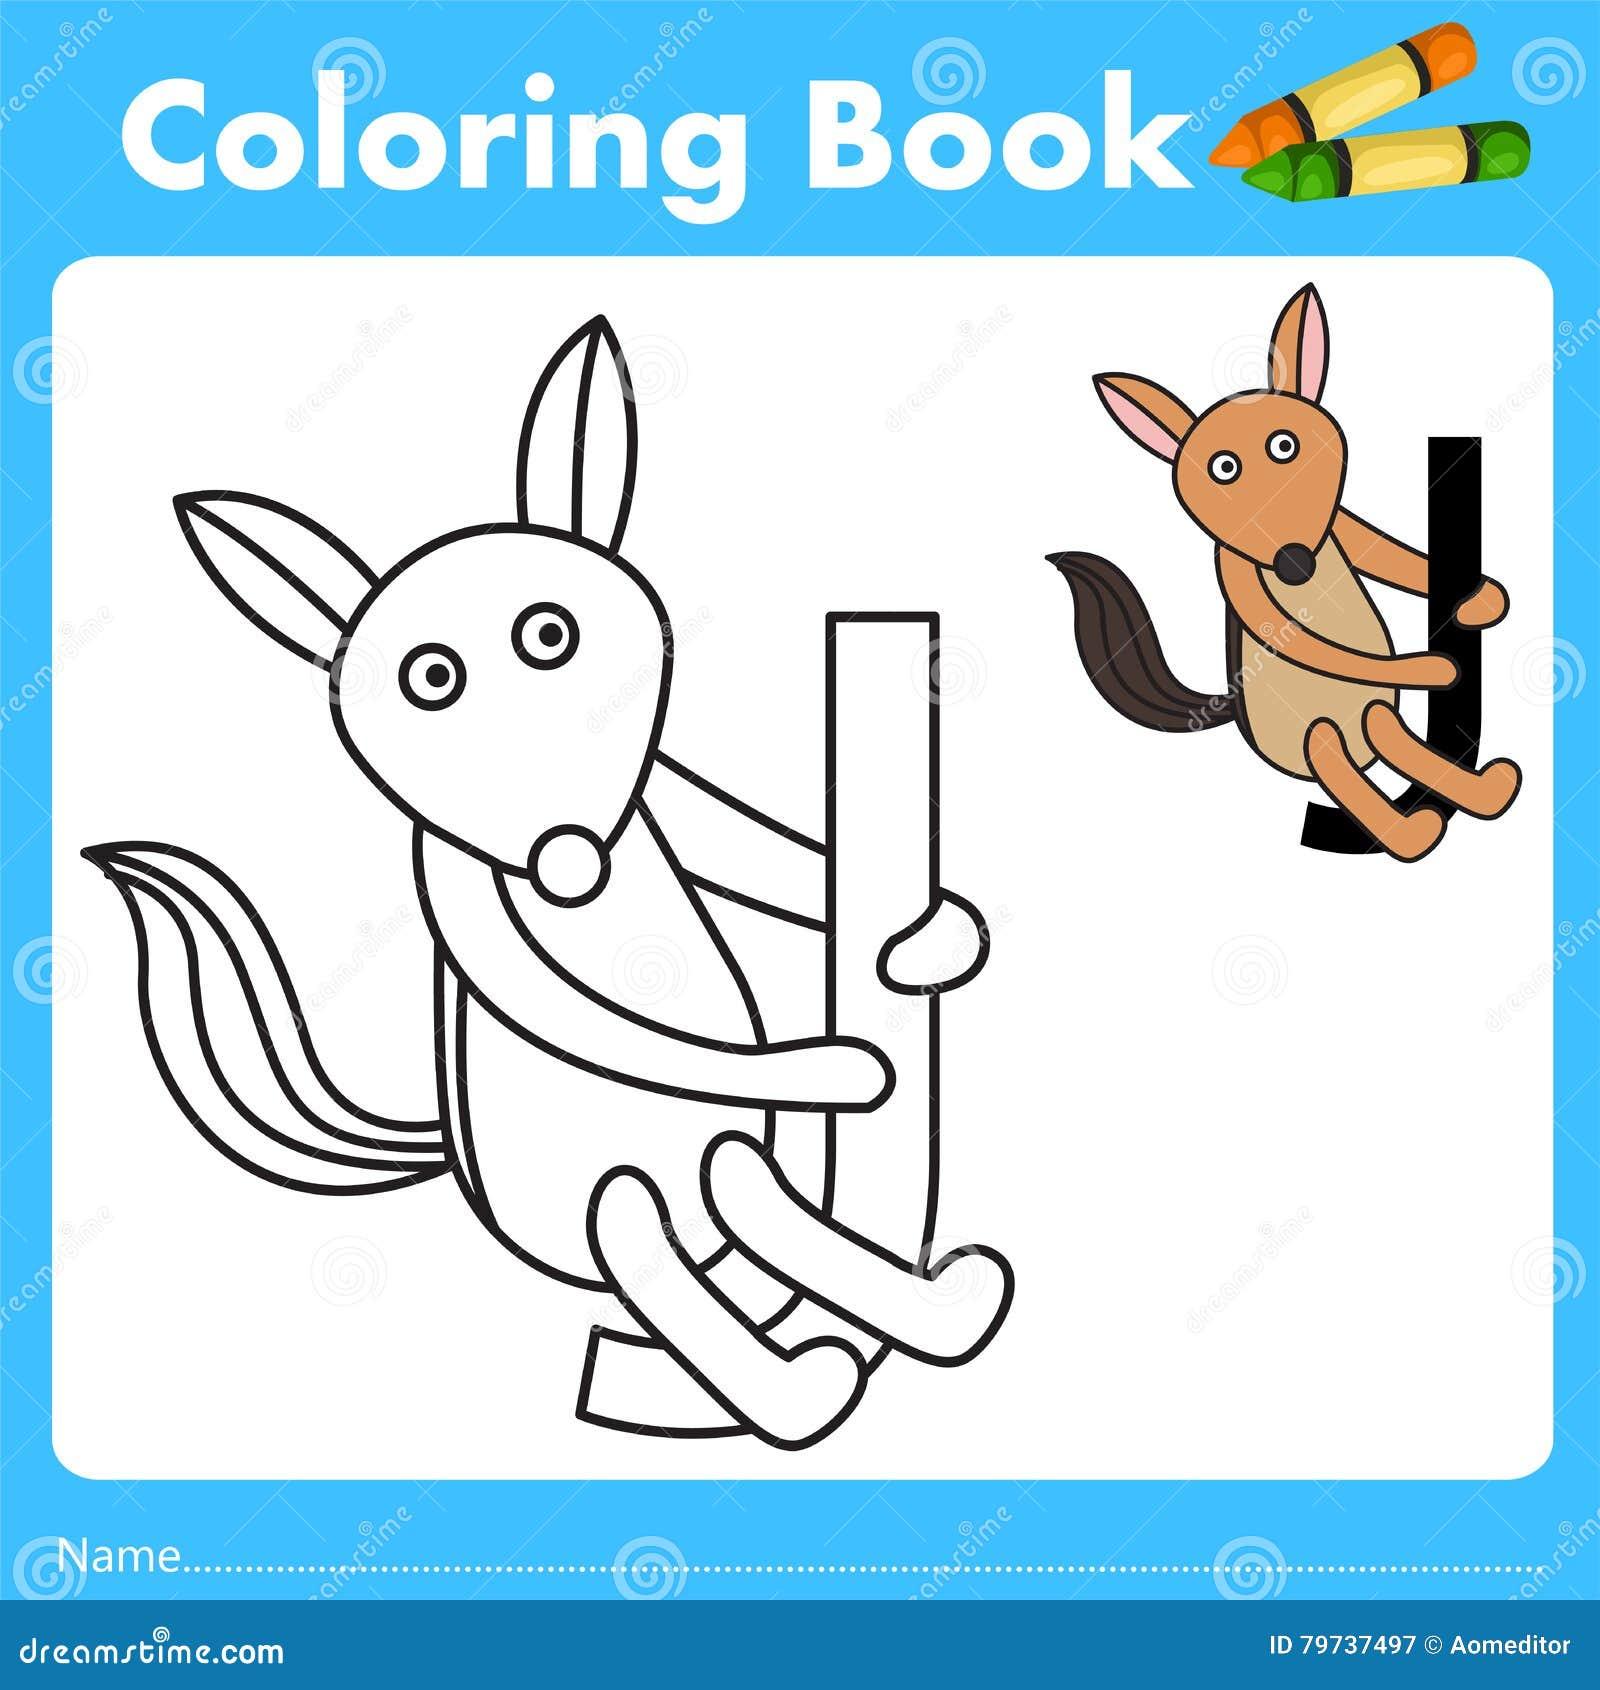 Book color illustrator - Illustrator Of Color Book With Jackal Animal